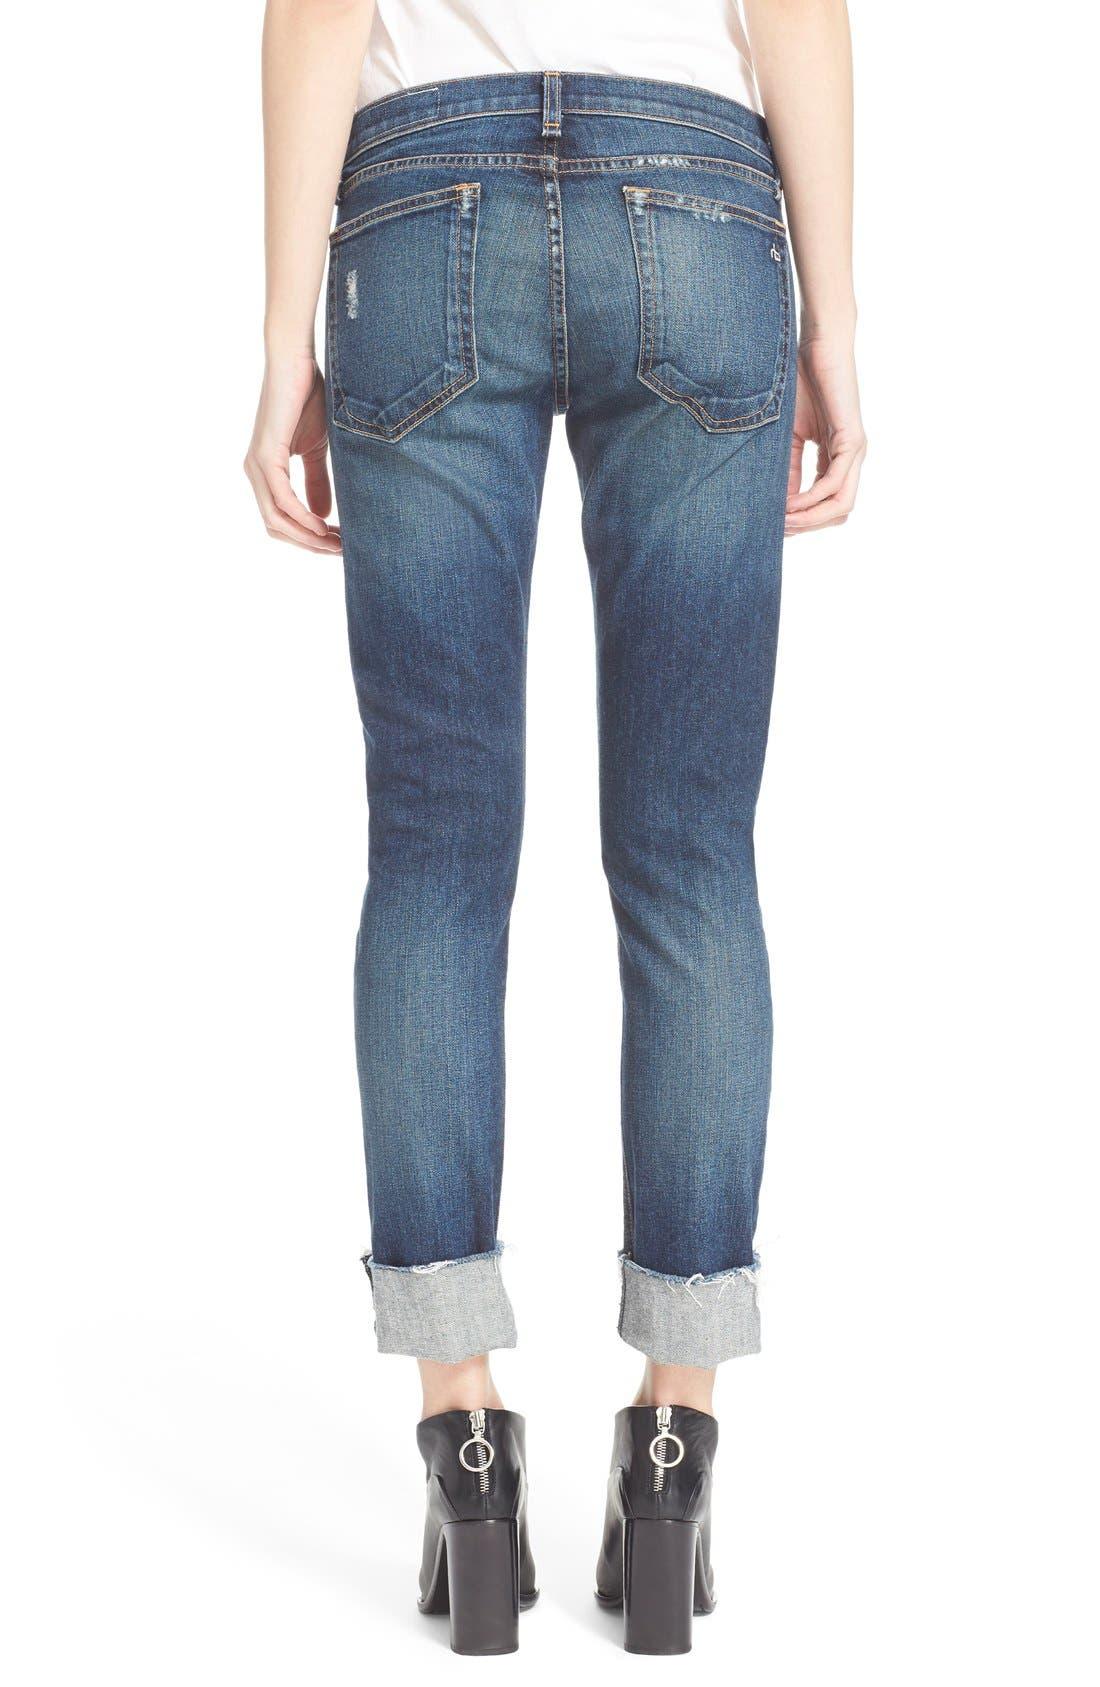 Alternate Image 3  - rag & bone/JEAN 'The Dre' Slim Fit Boyfriend Jeans (Mabel)